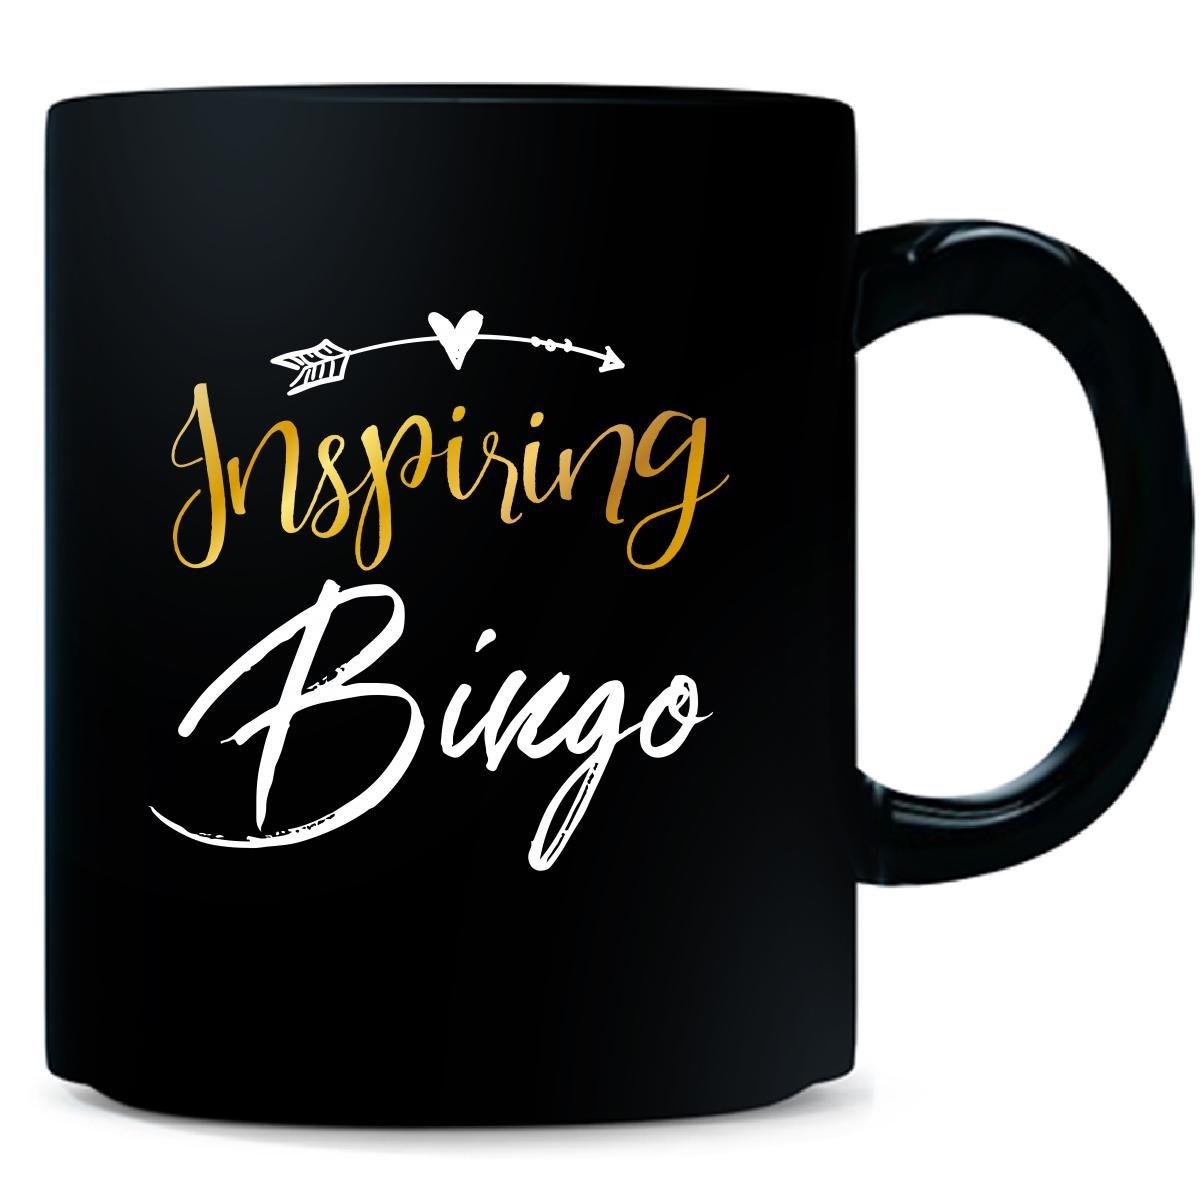 Inspiring Bingo Name Mothers Day Present Grandma - Mug